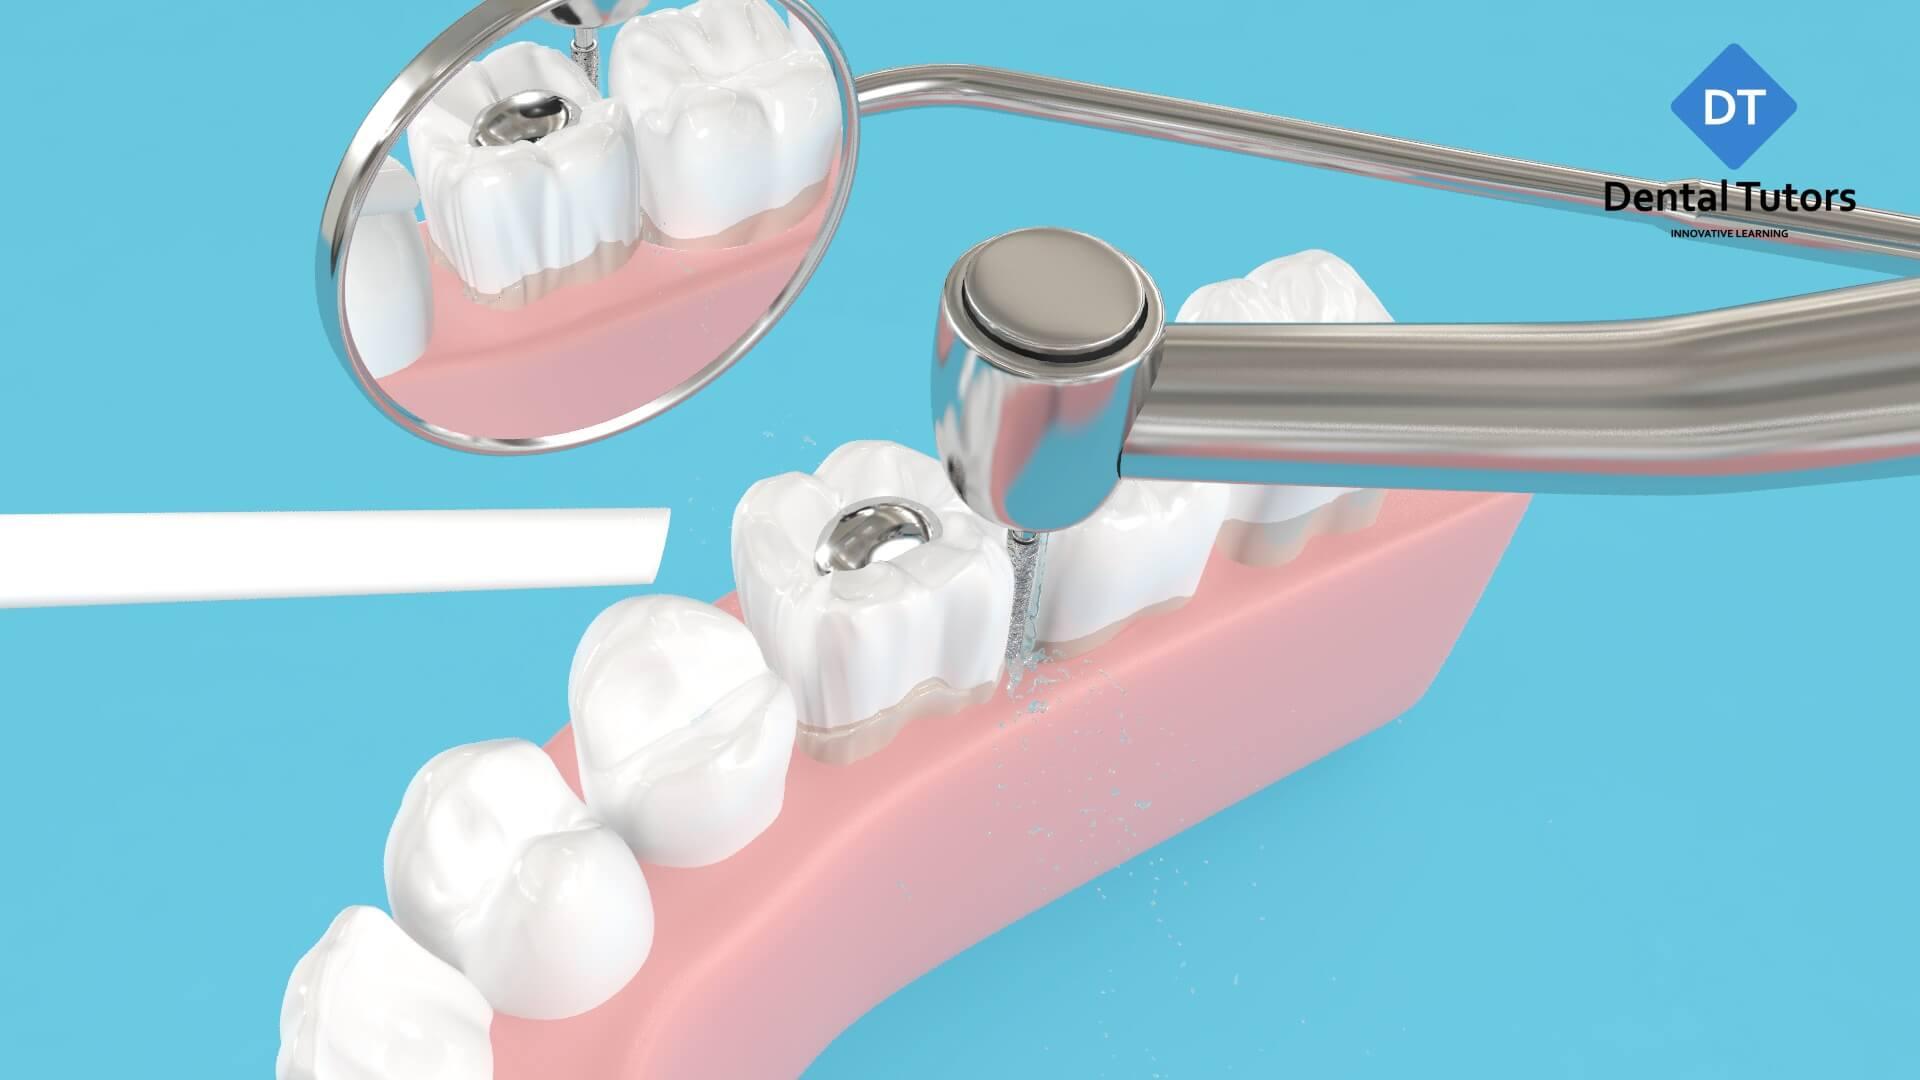 Dental crown preparation treatment